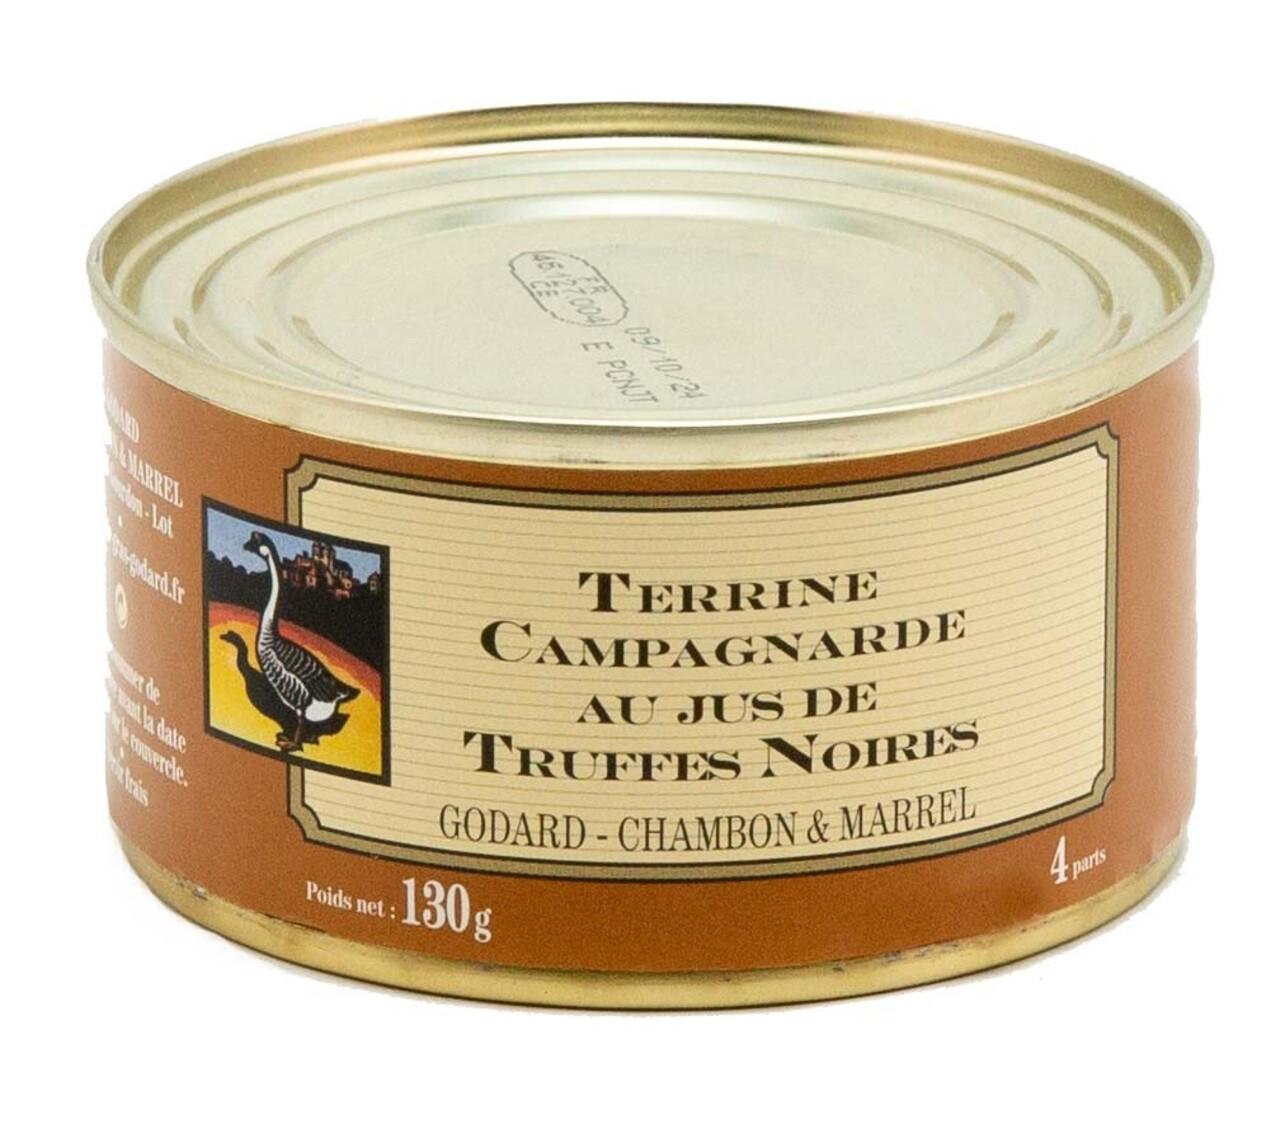 Terina taraneasca cu suc de trufe negre, Godard Chambon & Marell, 130g